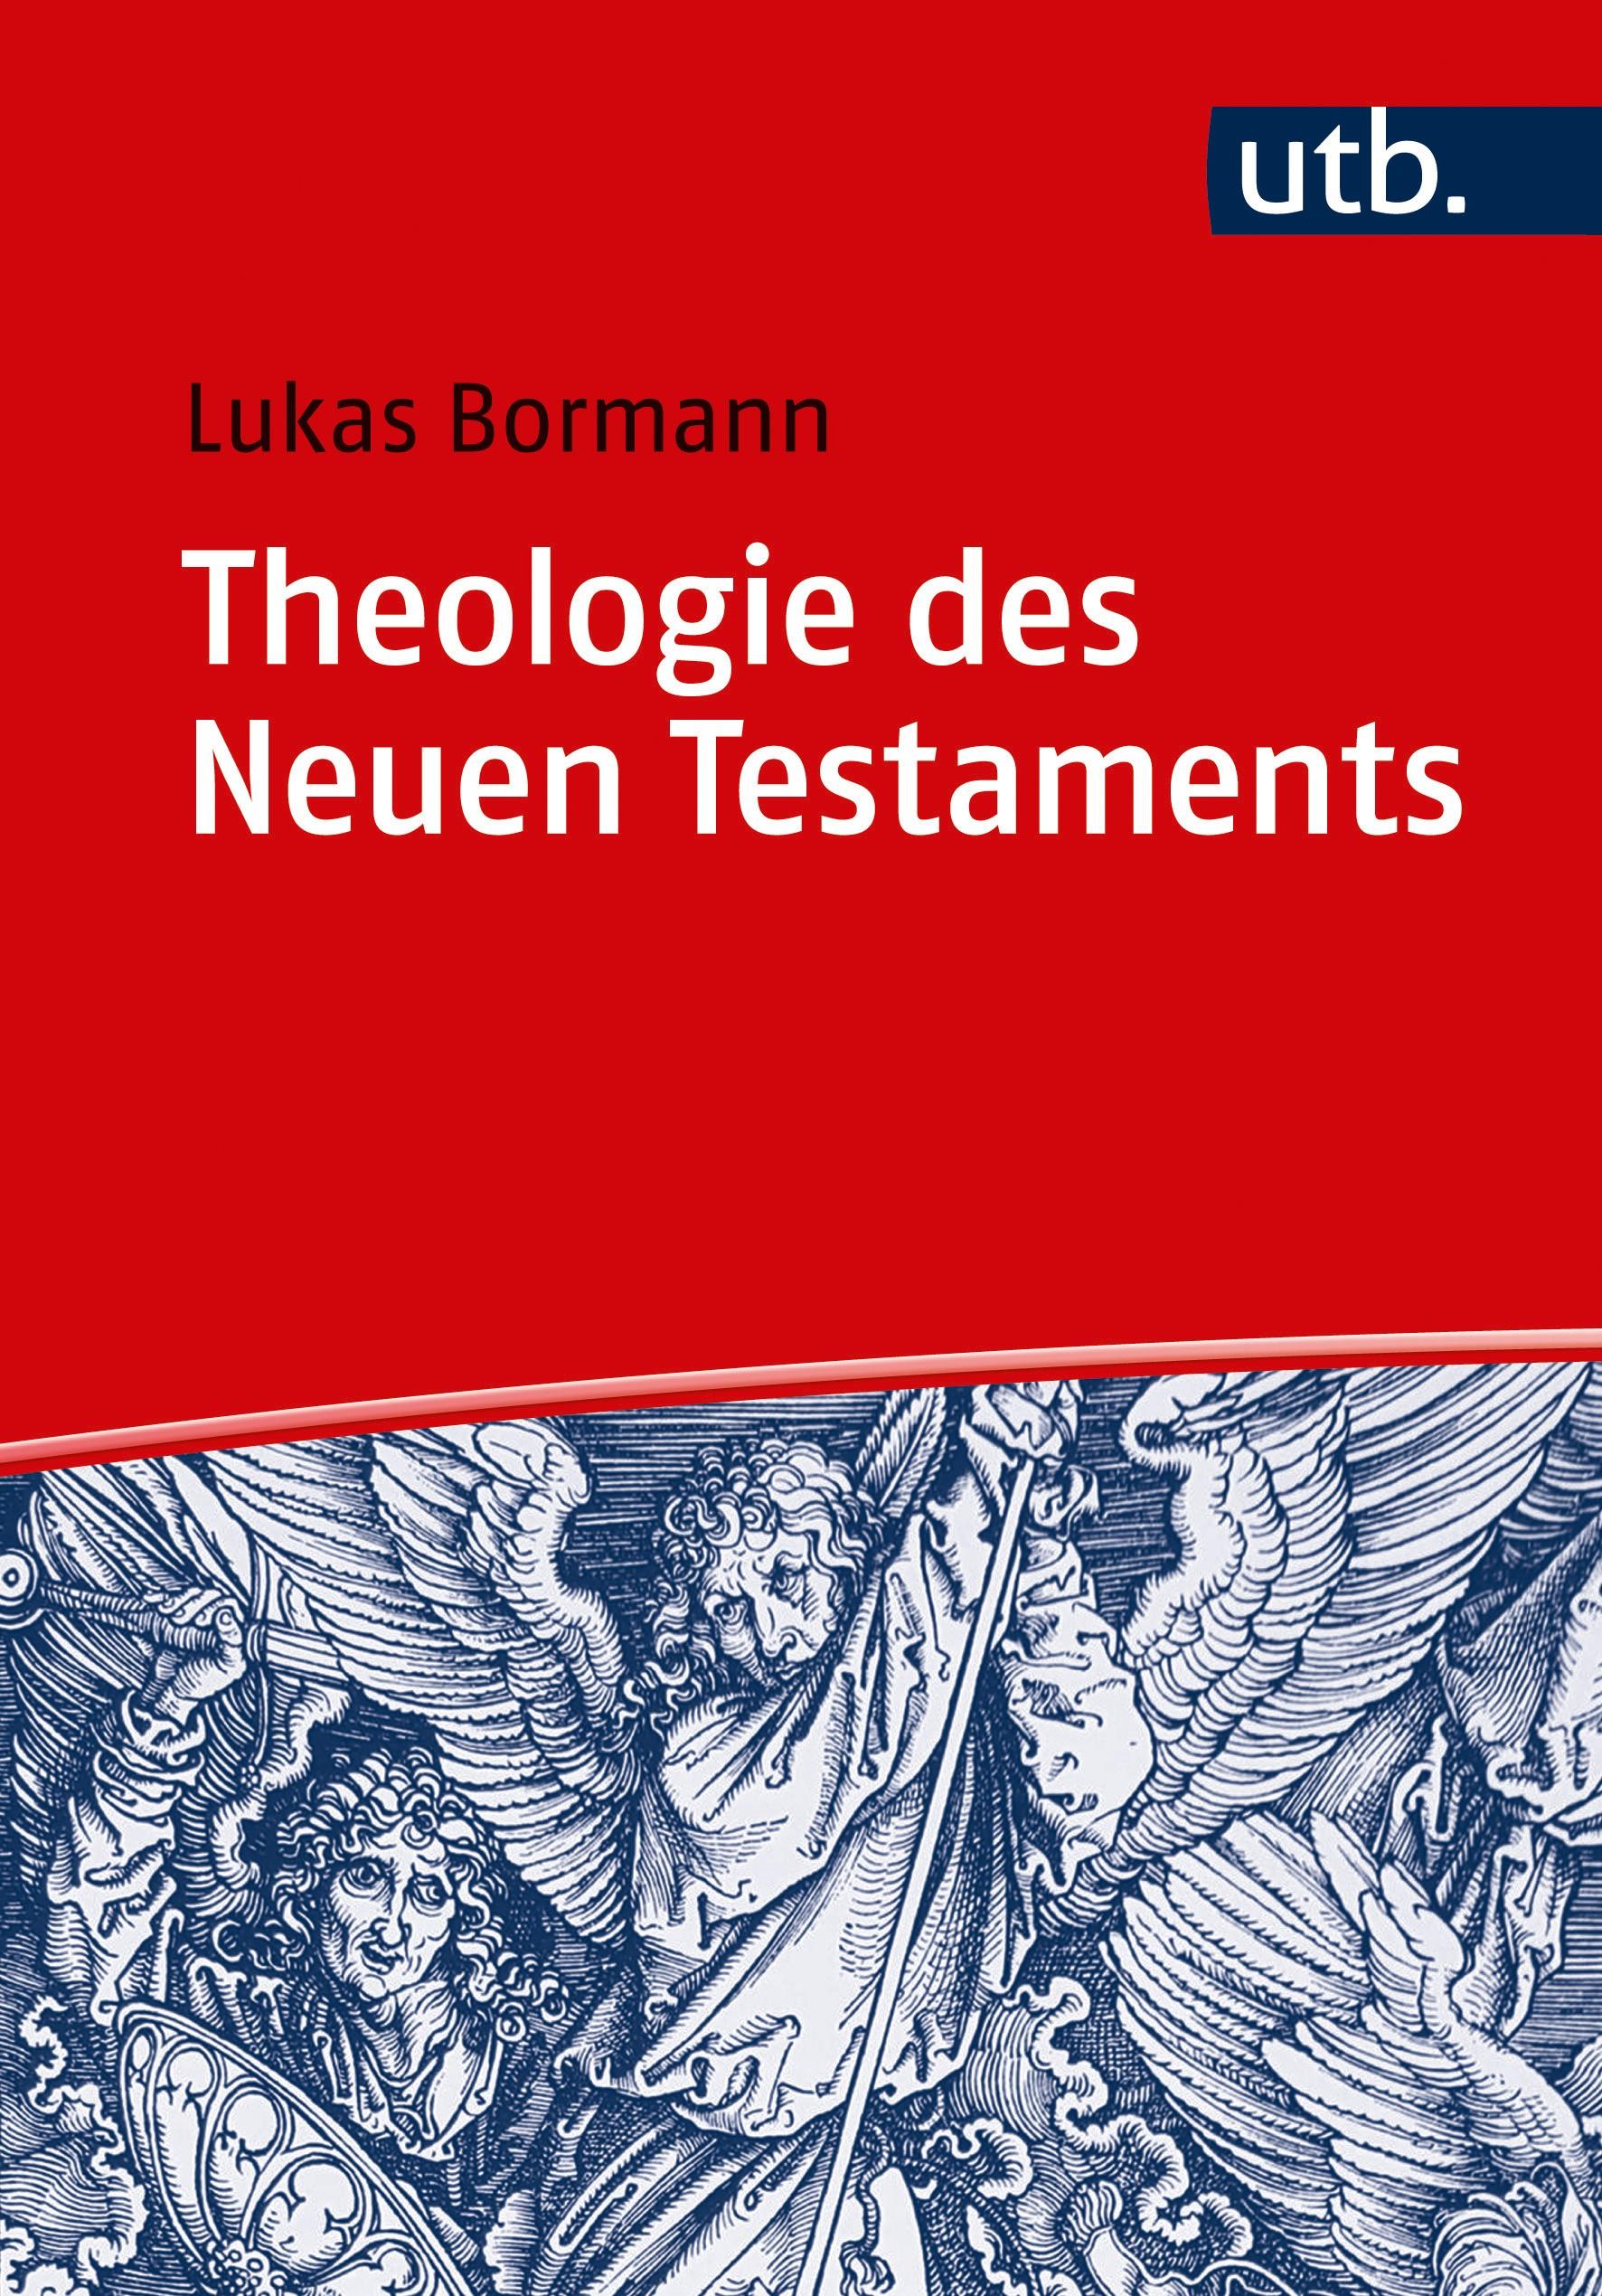 Theologie des Neuen Testaments | Bormann, 2017 | Buch (Cover)